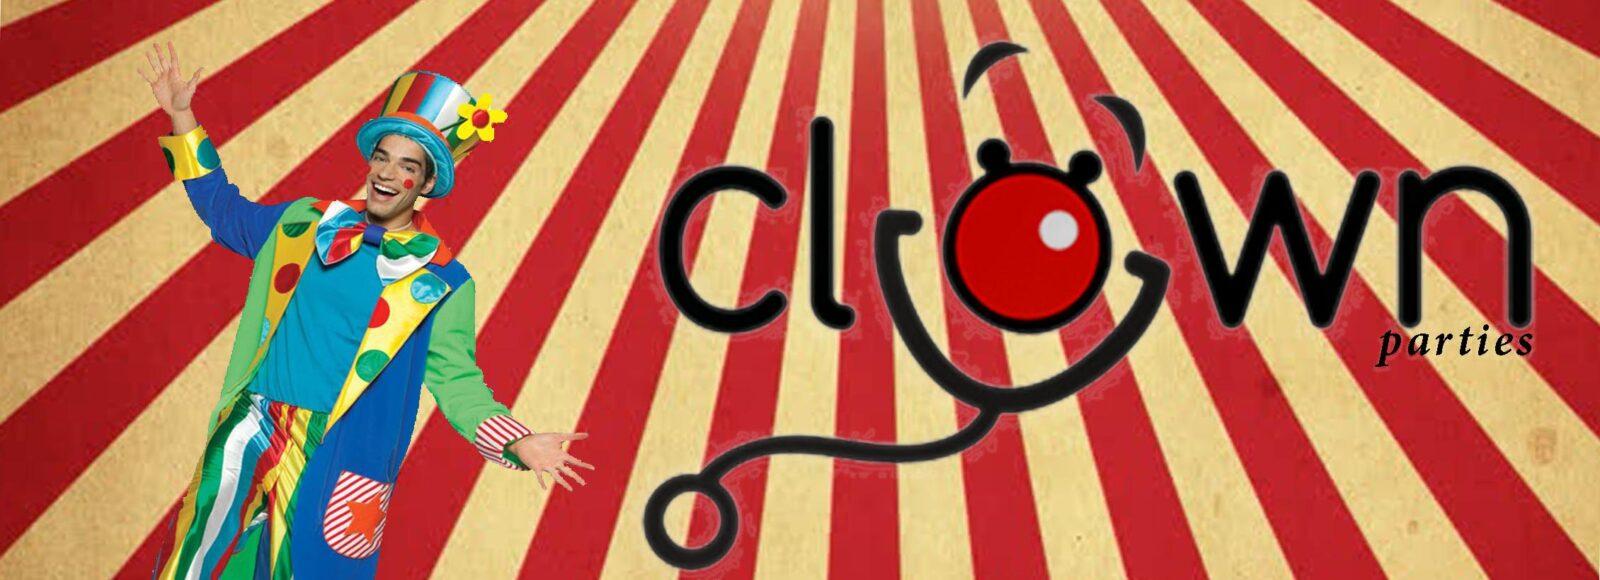 clownpartiesbanner-min